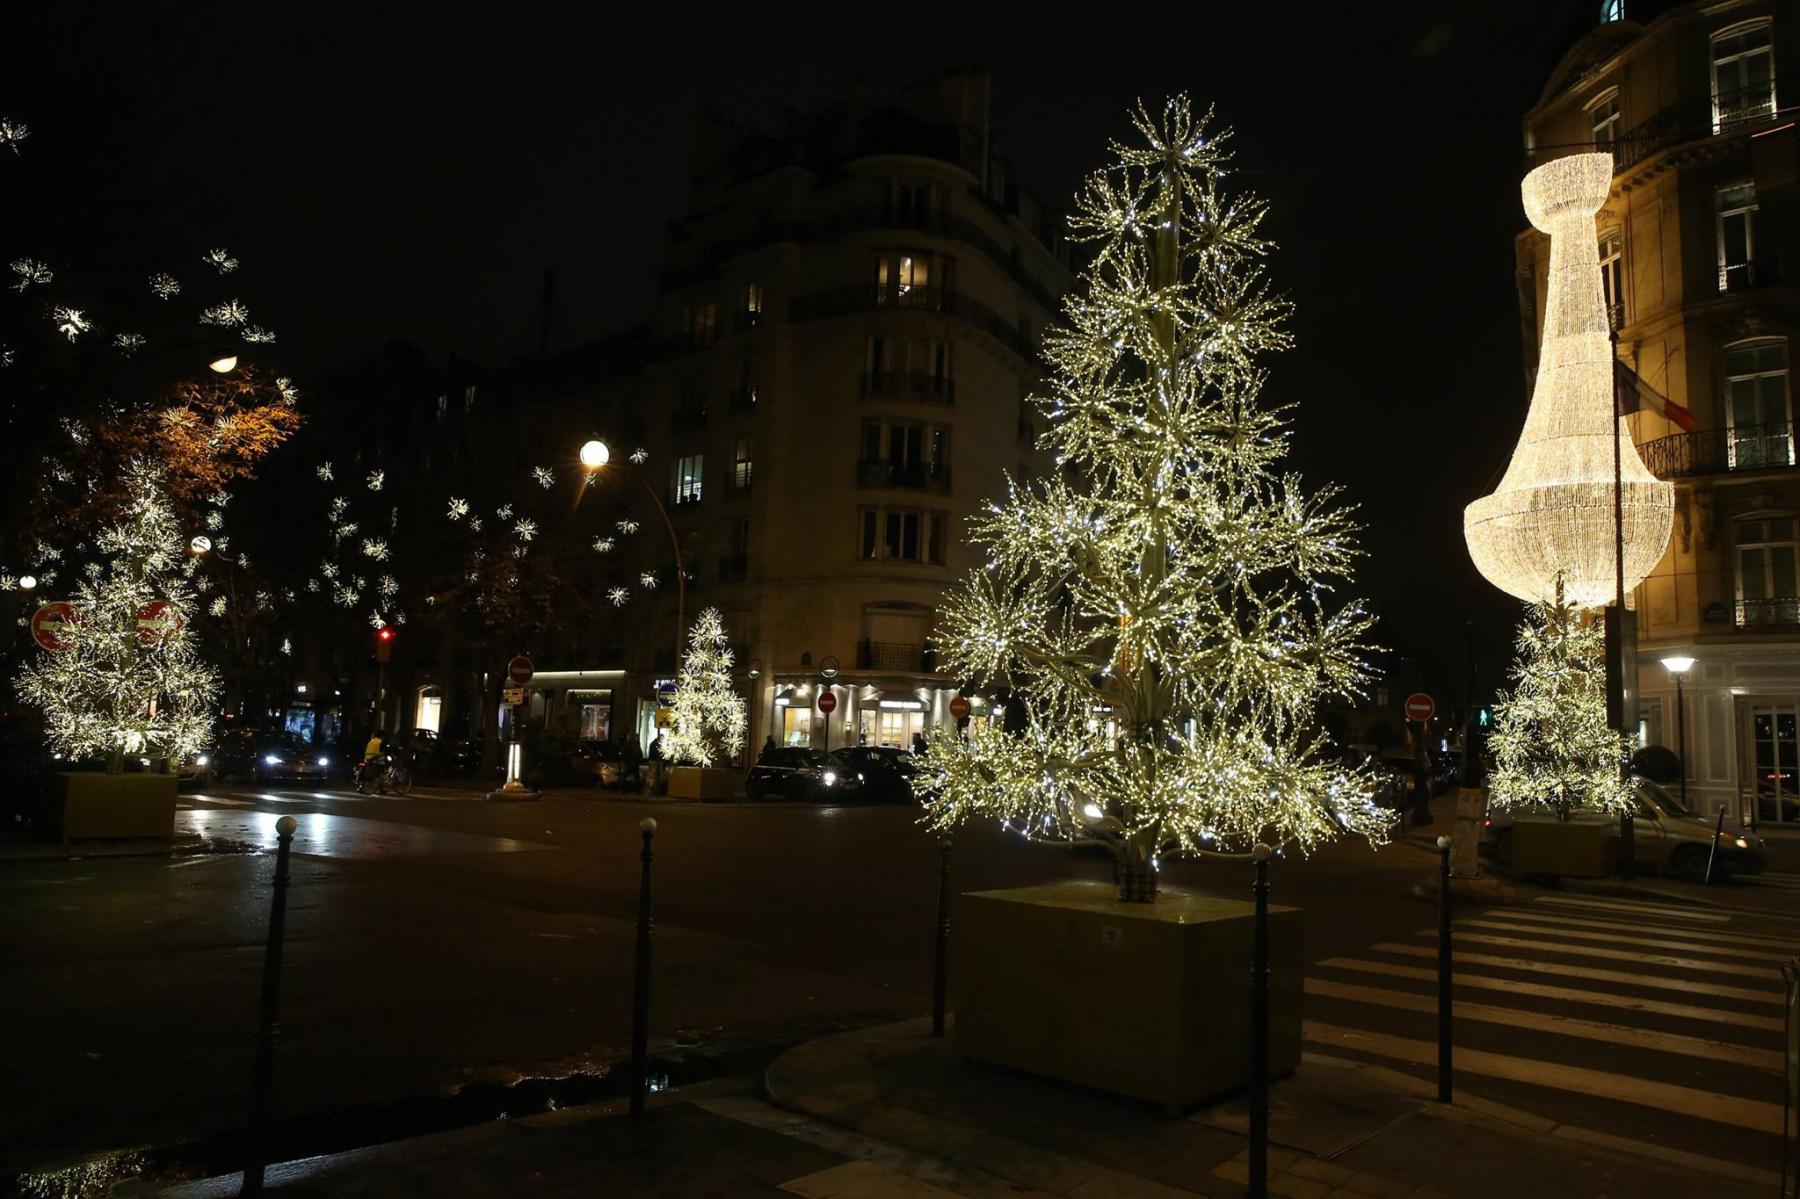 Christmas Lights In Paris.Avenue Montaigne Paris Christmas Lights 2018 Christmas